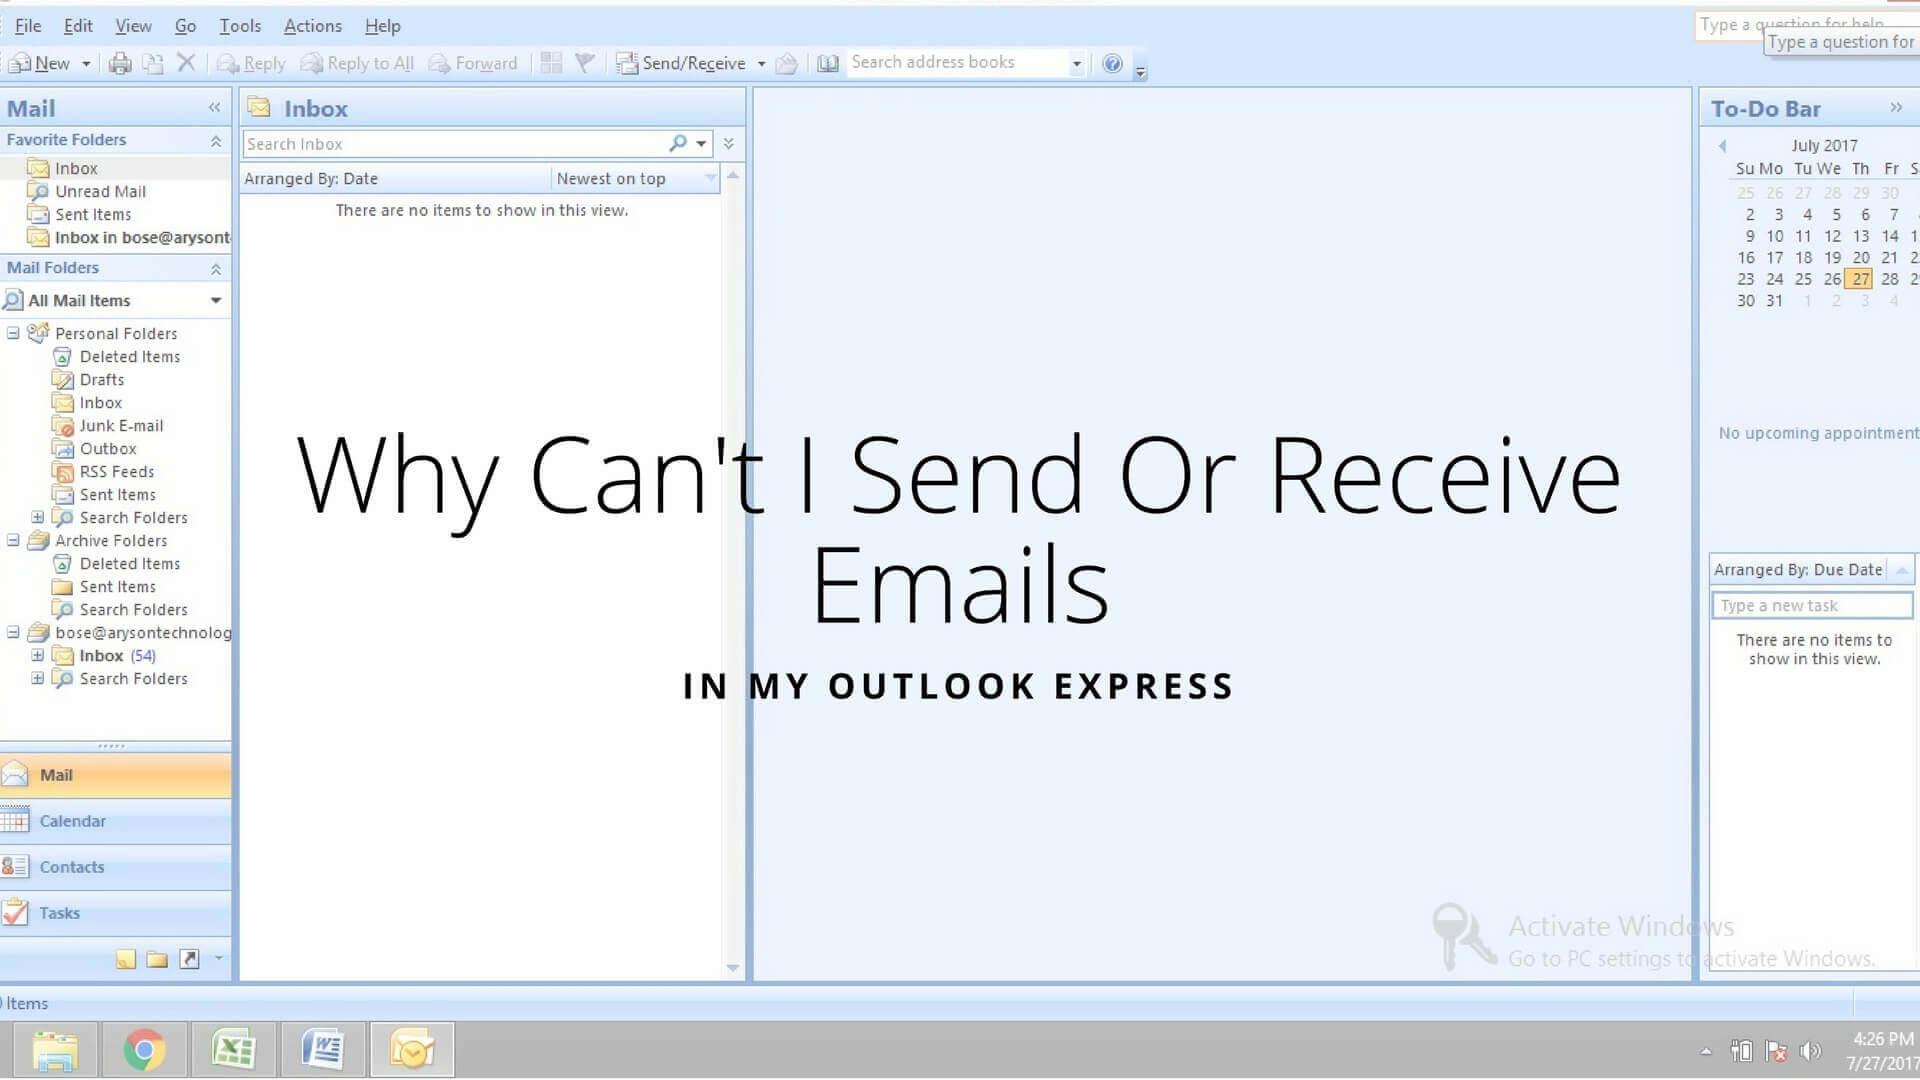 Outlook Express 2gb limit problem